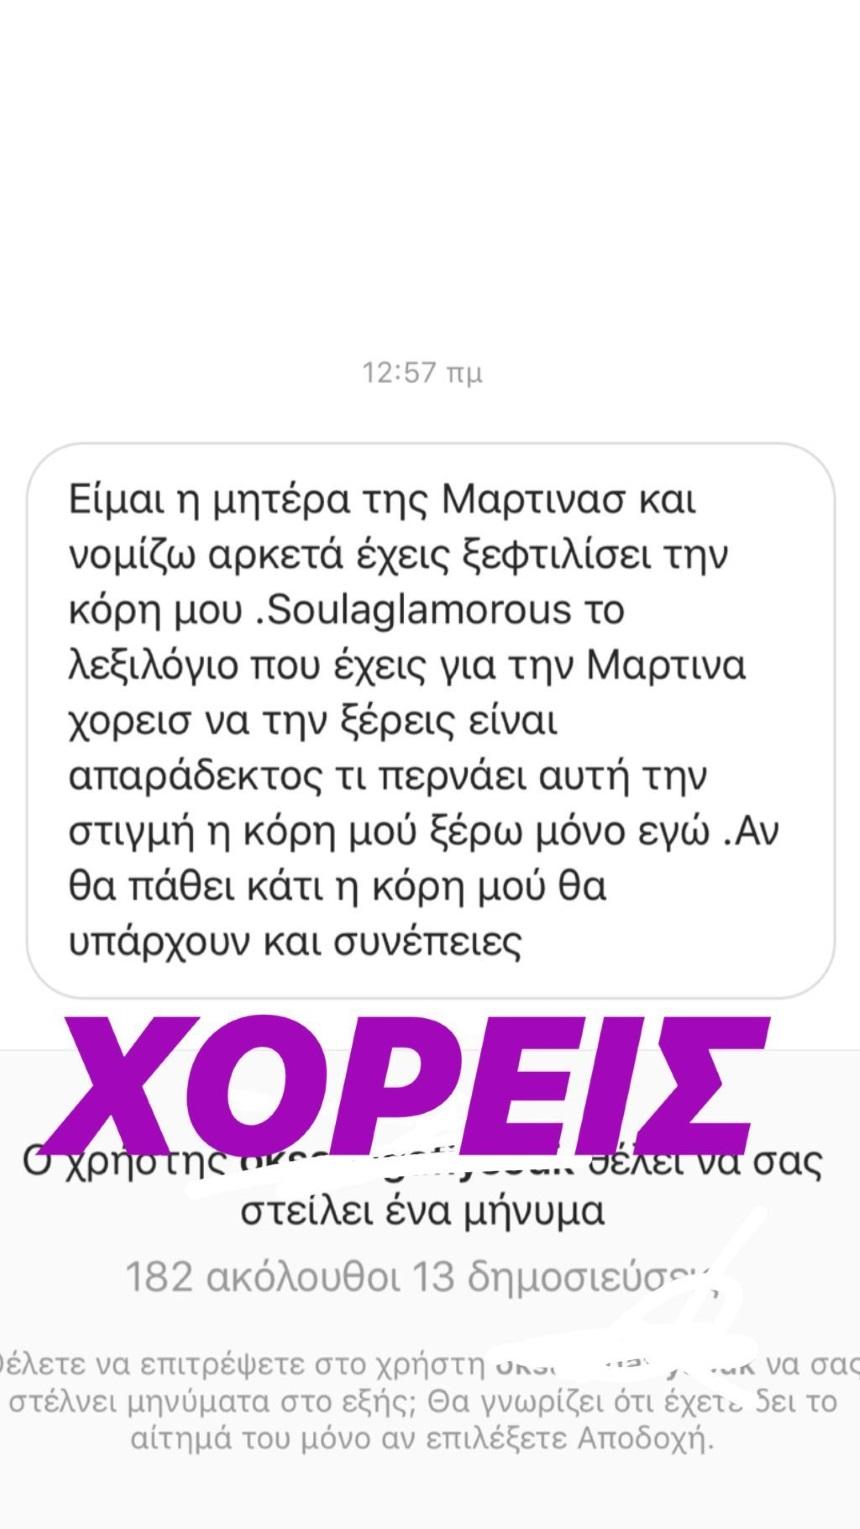 GNTM: Κι όμως η μητέρα της Μαρτίνας έστειλε μήνυμα στην Soula Glamorous! Δες πώς της απάντησε